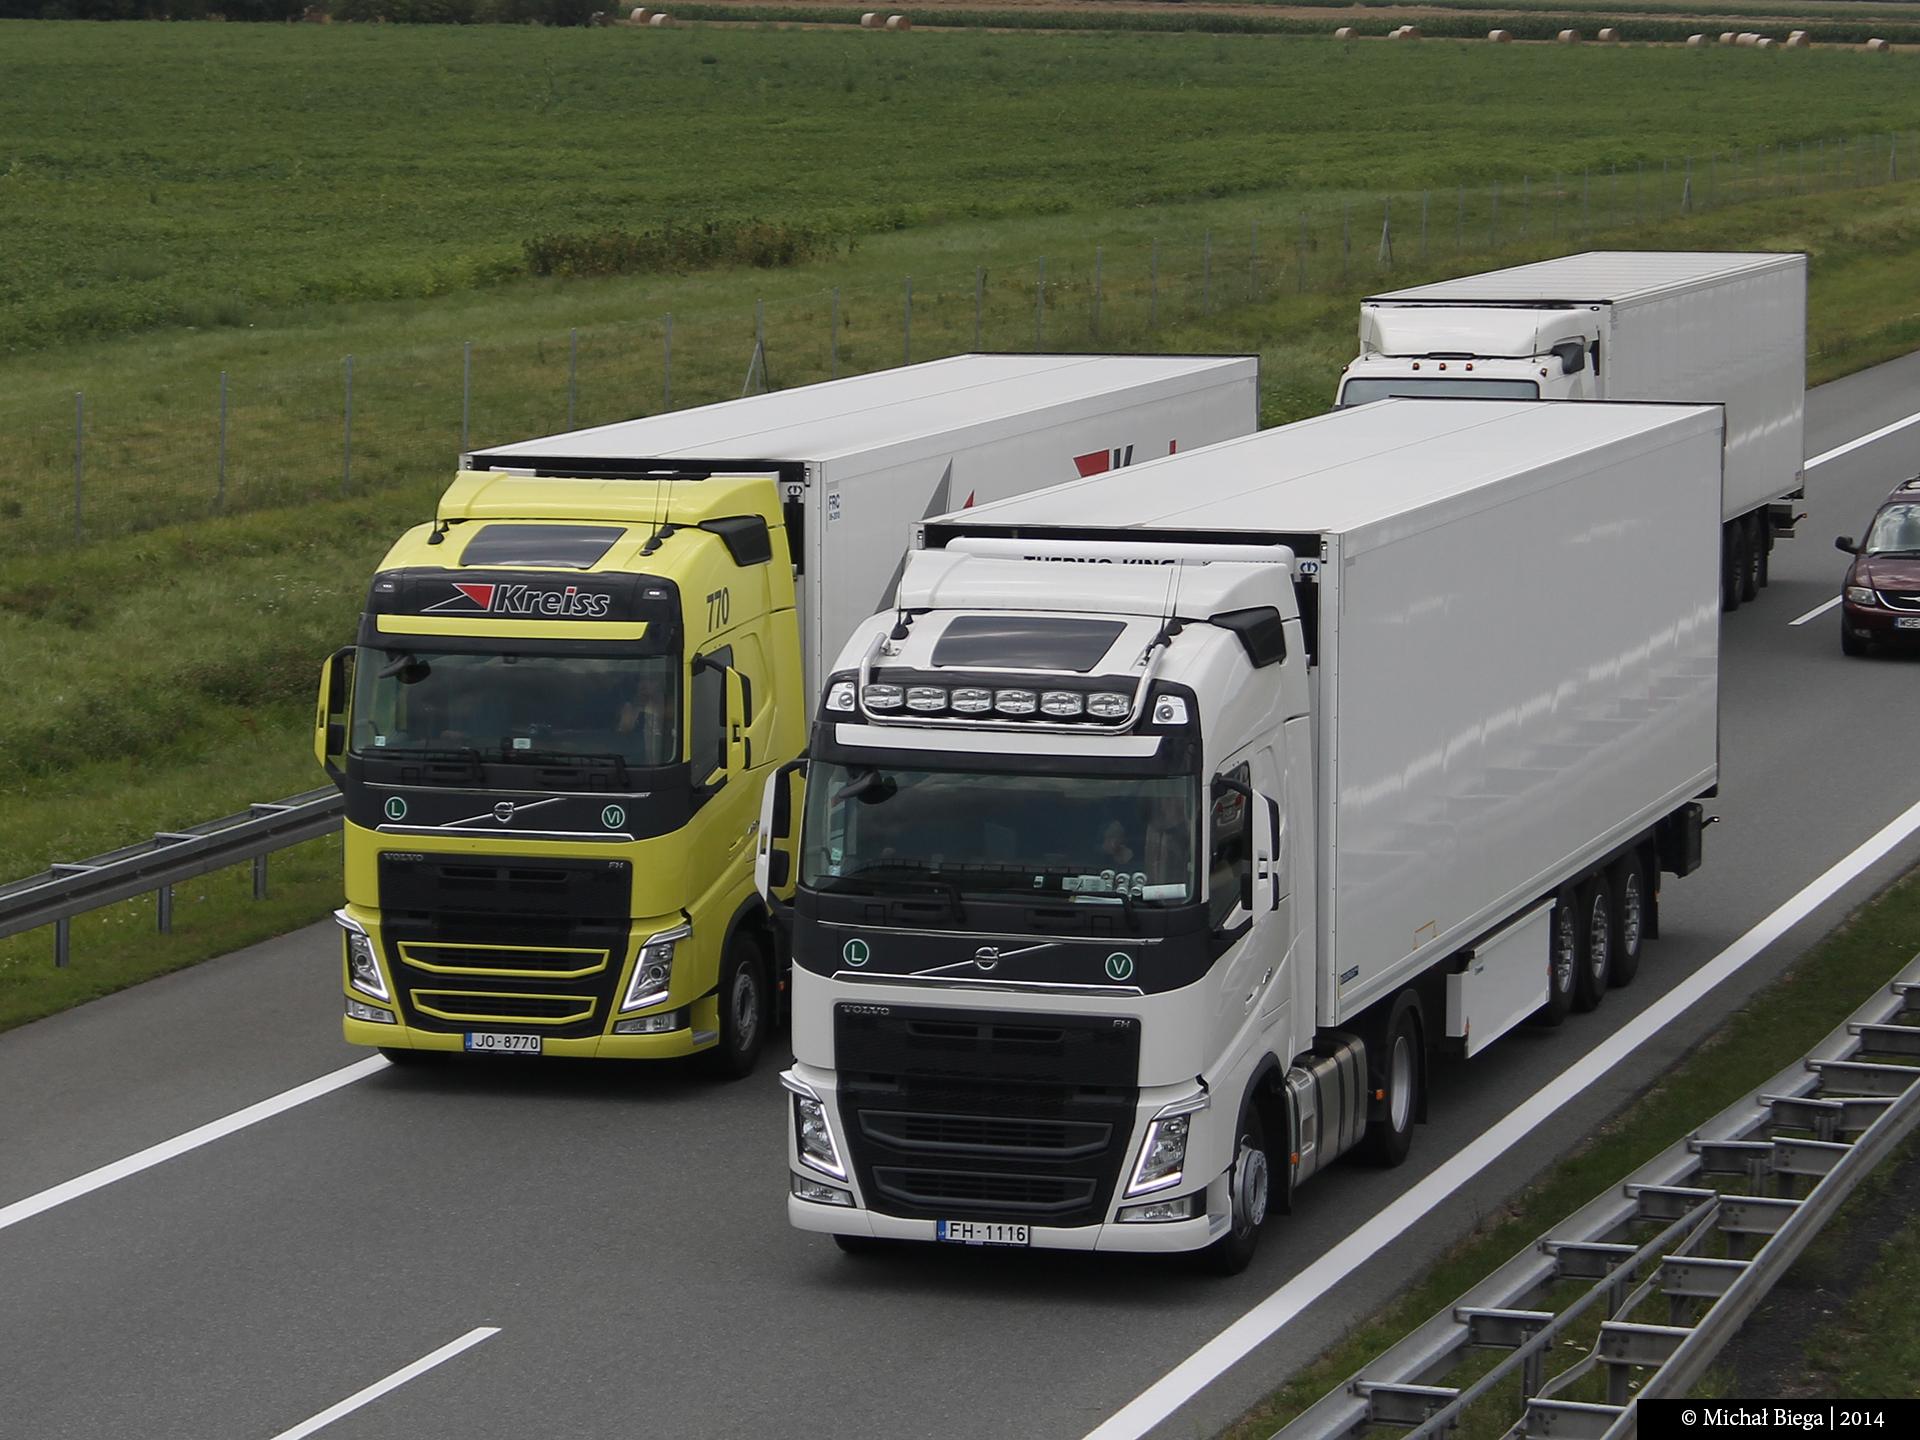 Wallpaper Road Highway Volvo Asphalt Truck IV A2 Automotive Design Exterior Compact Car Motor Vehicle Mode Of Transport